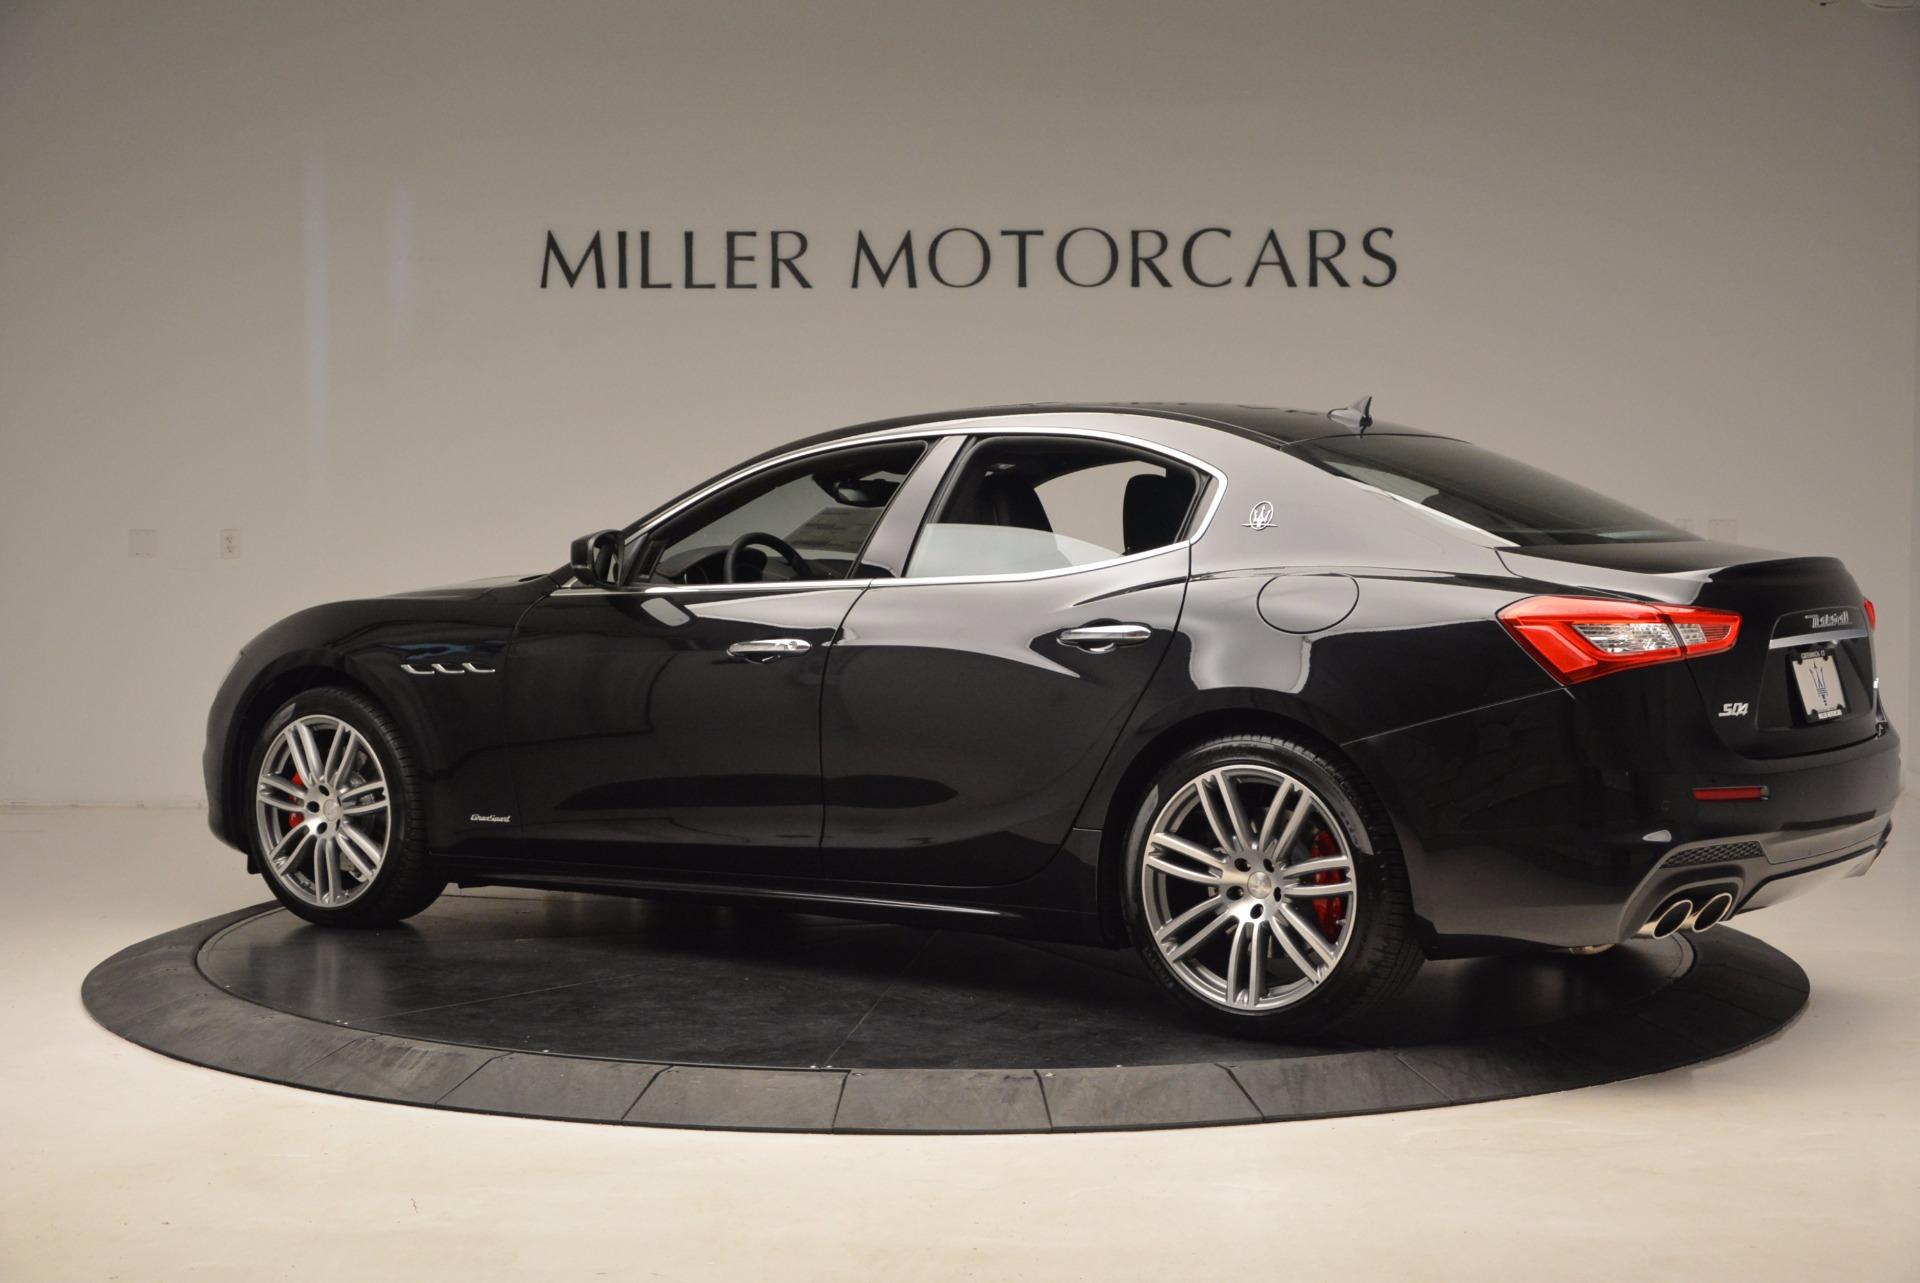 New 2018 Maserati Ghibli S Q4 GranSport For Sale In Greenwich, CT 1541_p4